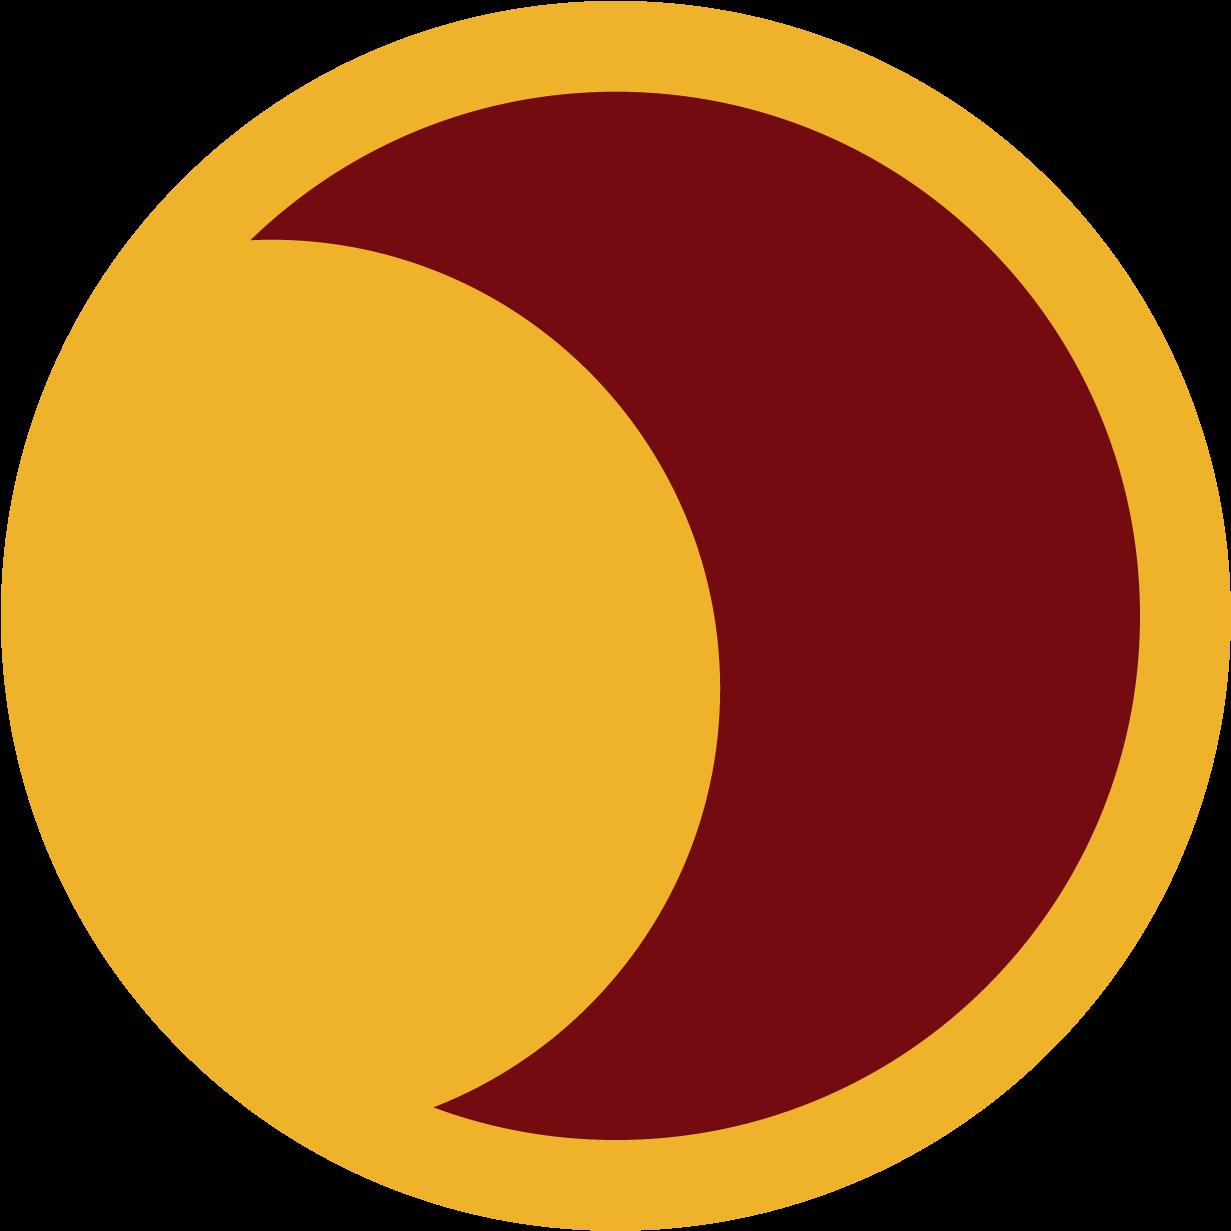 2017 Solar Eclipse.